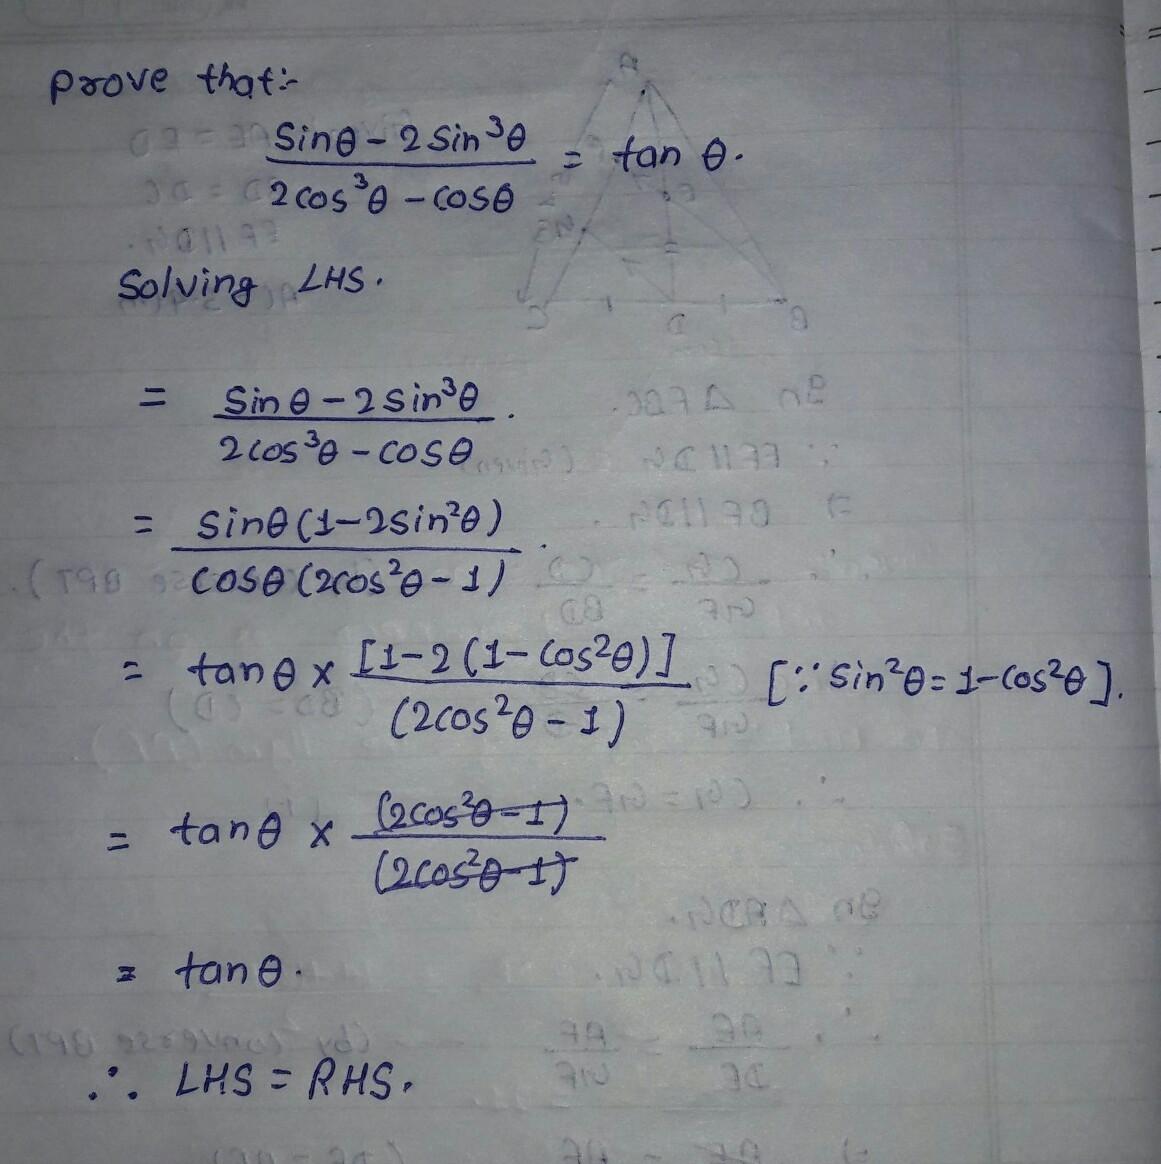 Prove Sin Theta 2sin Cube Theta 2cos Cube Theta Cos Theta Tan Theta Brainly In